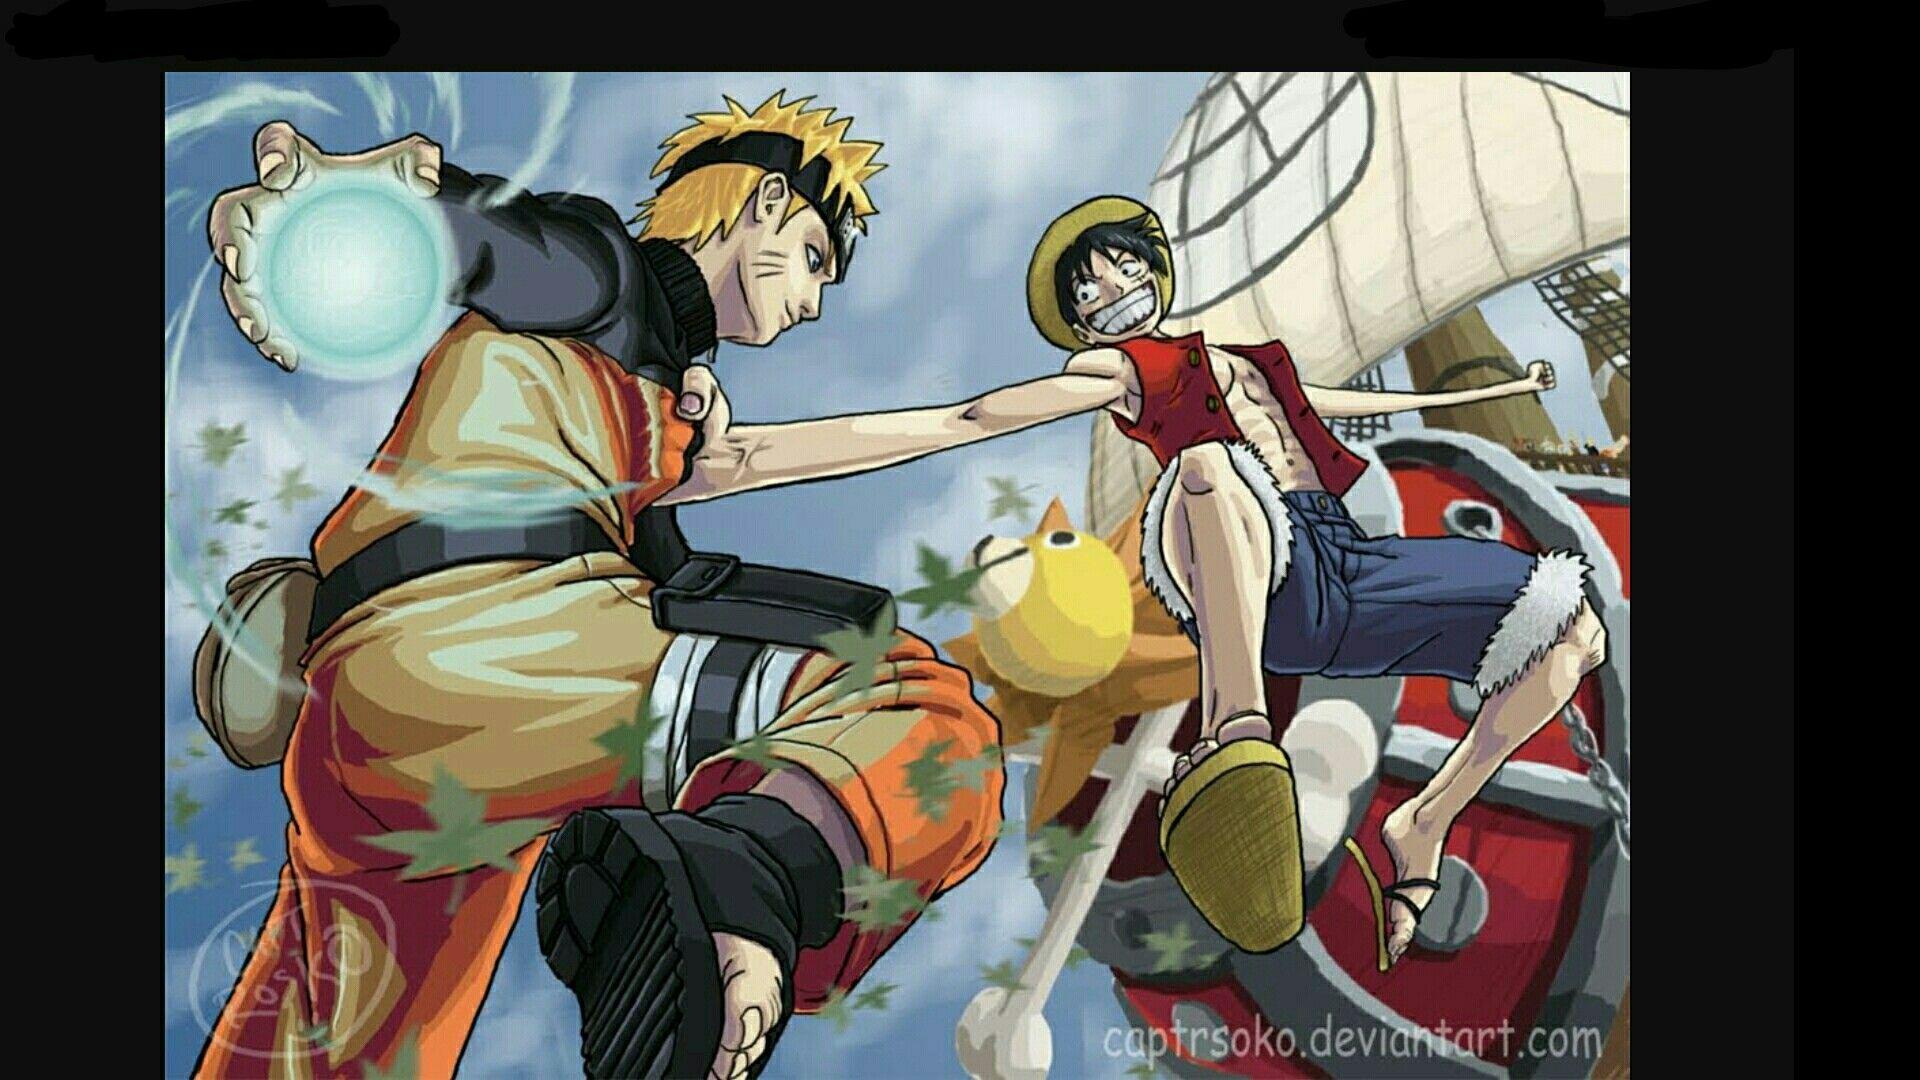 Fantastic Wallpaper Naruto Savage - 80ca605adb3a742804ded42ed5989fdf  Snapshot.jpg